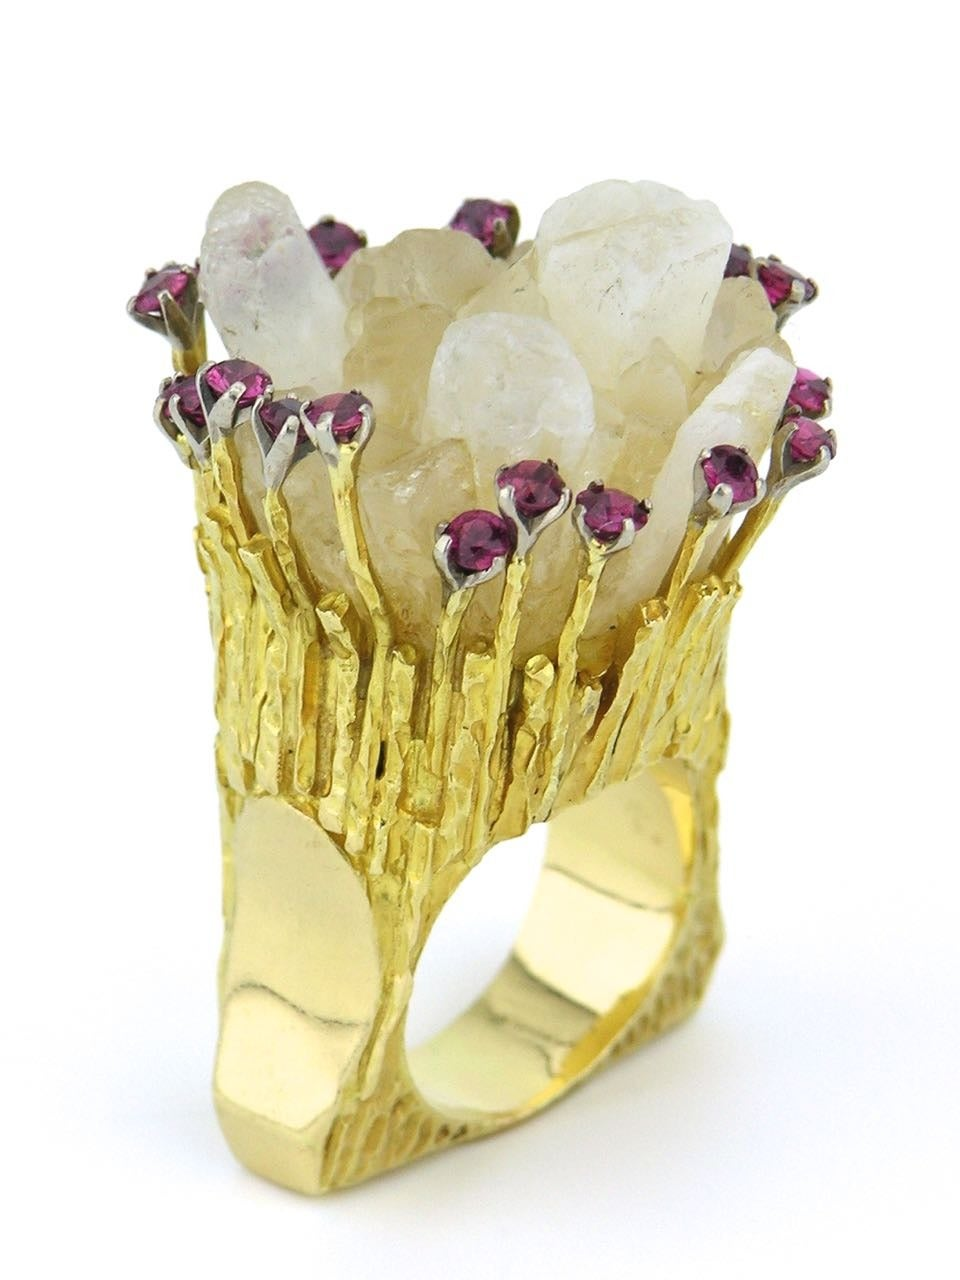 1970s Australian Quartz Ruby Gold Large Organic Ring For